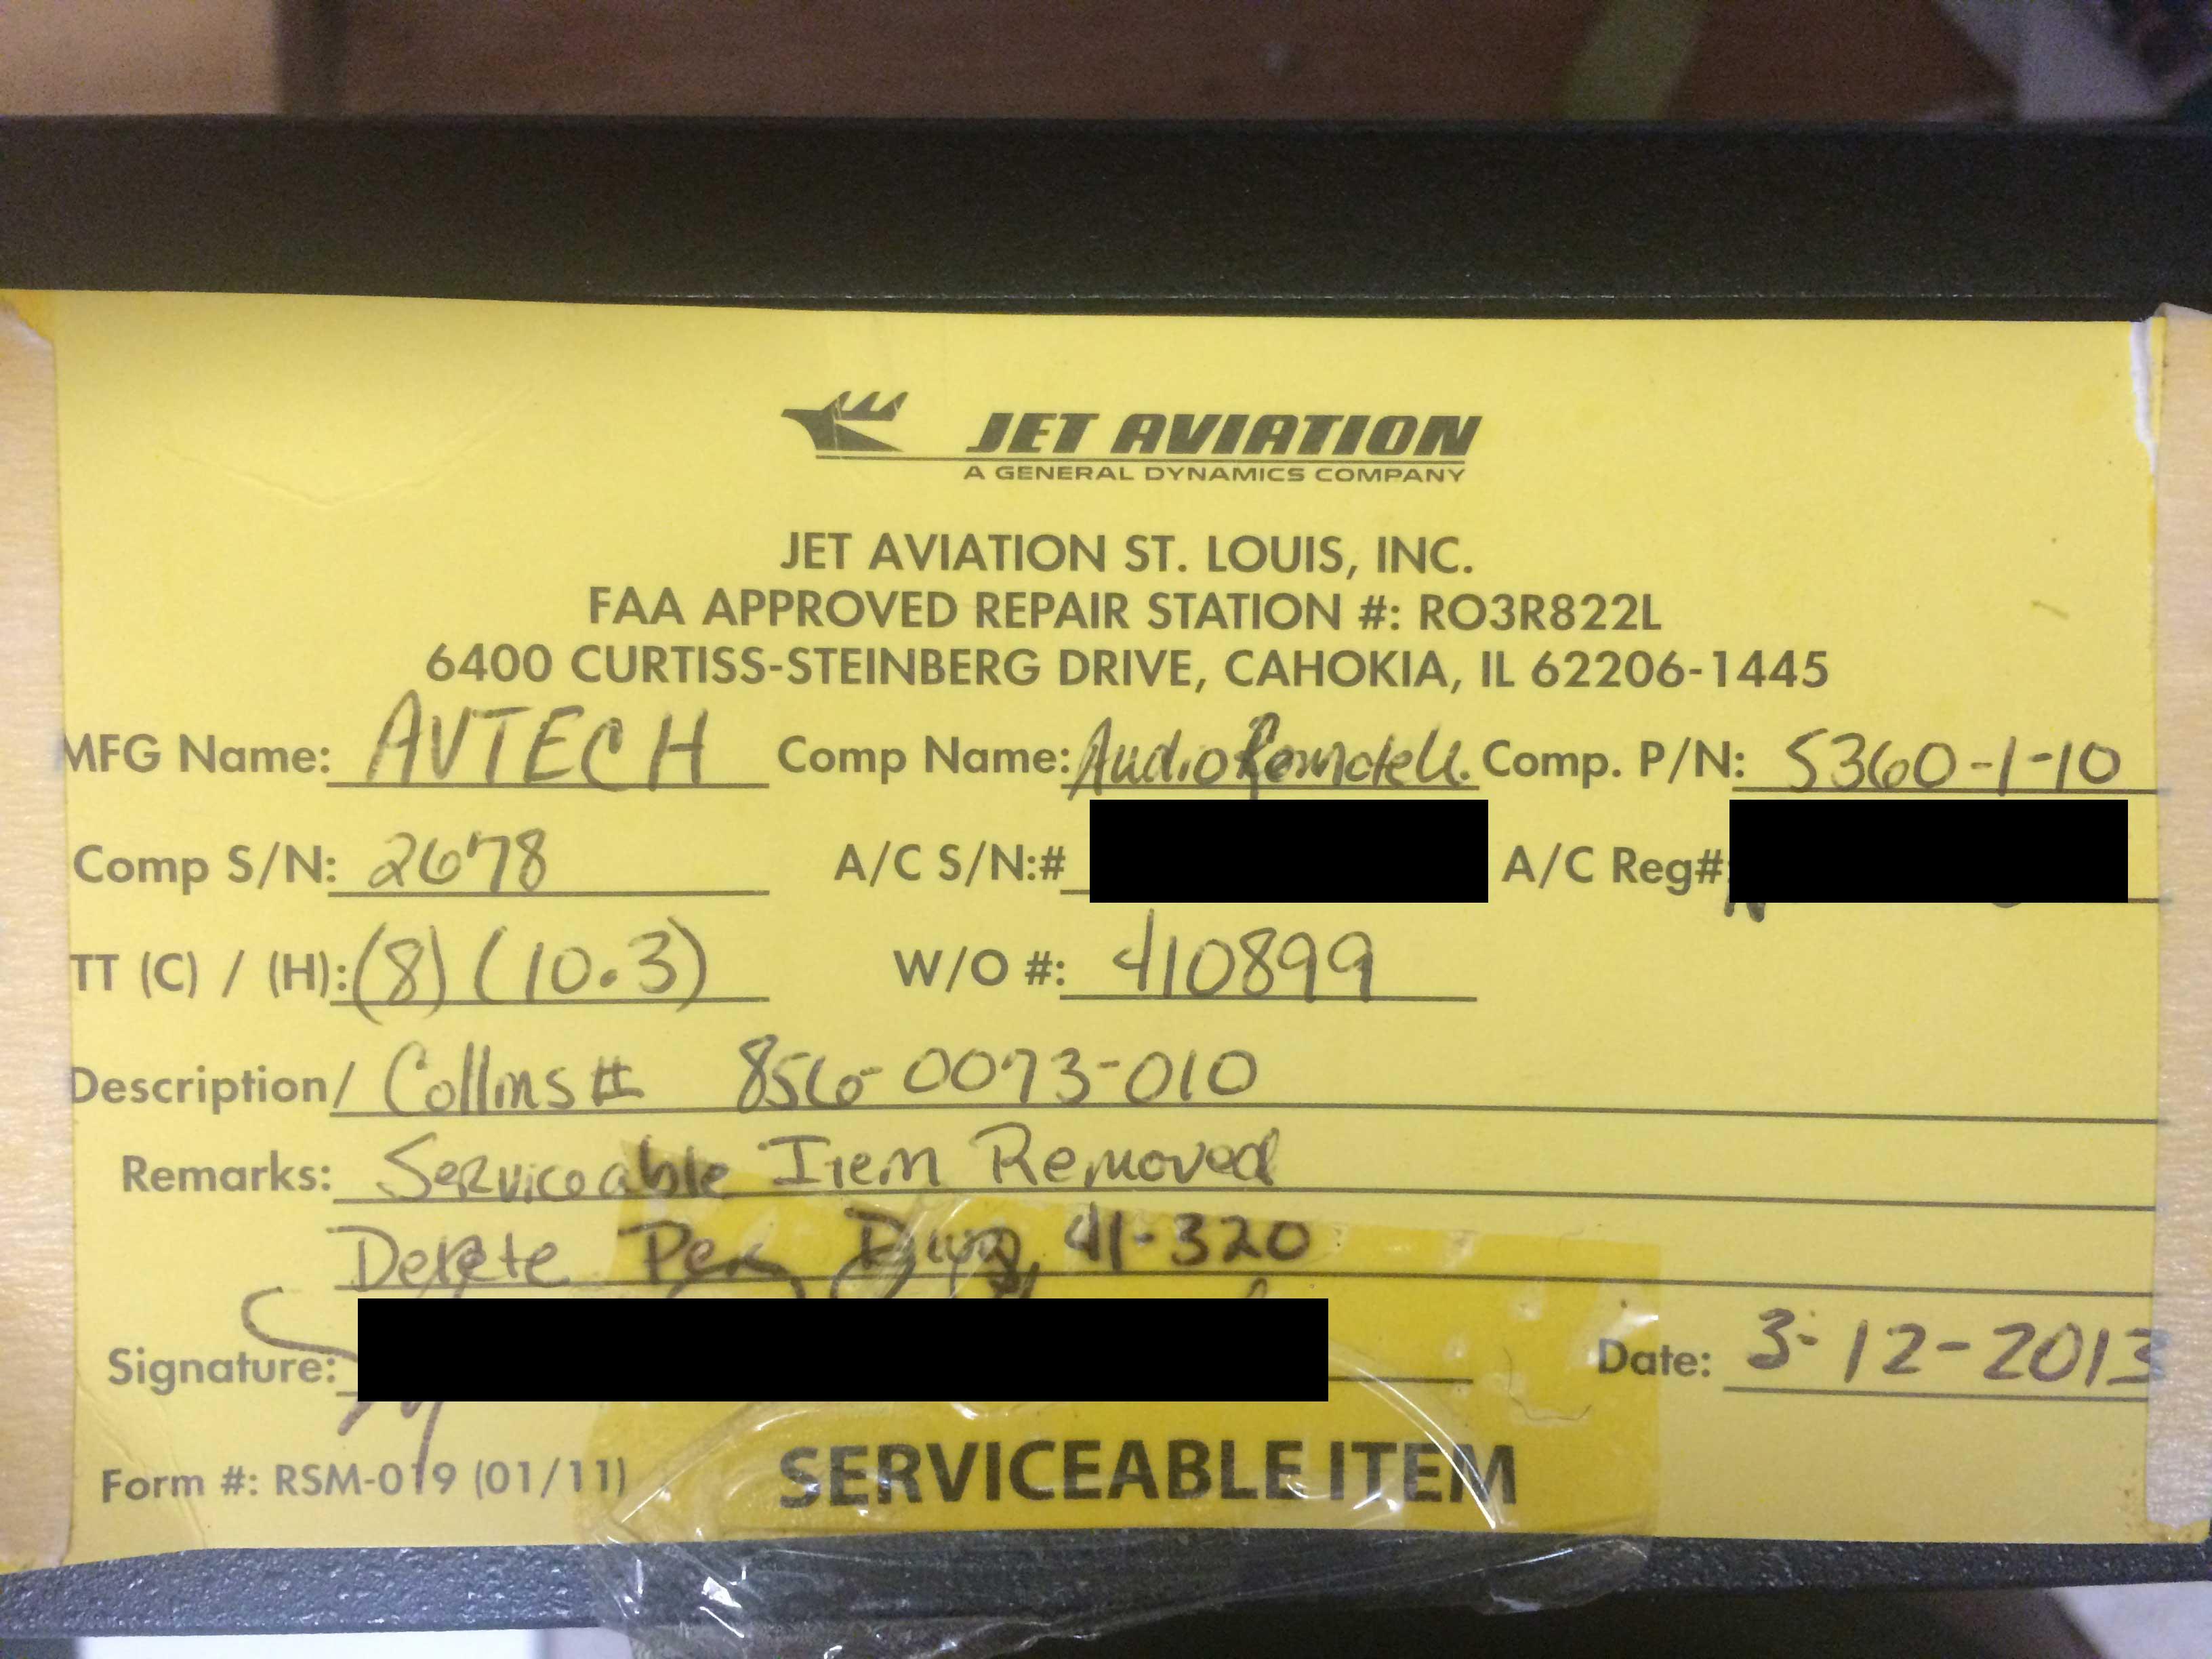 Avtech Audio Remote Unit P/N 5360-1-10